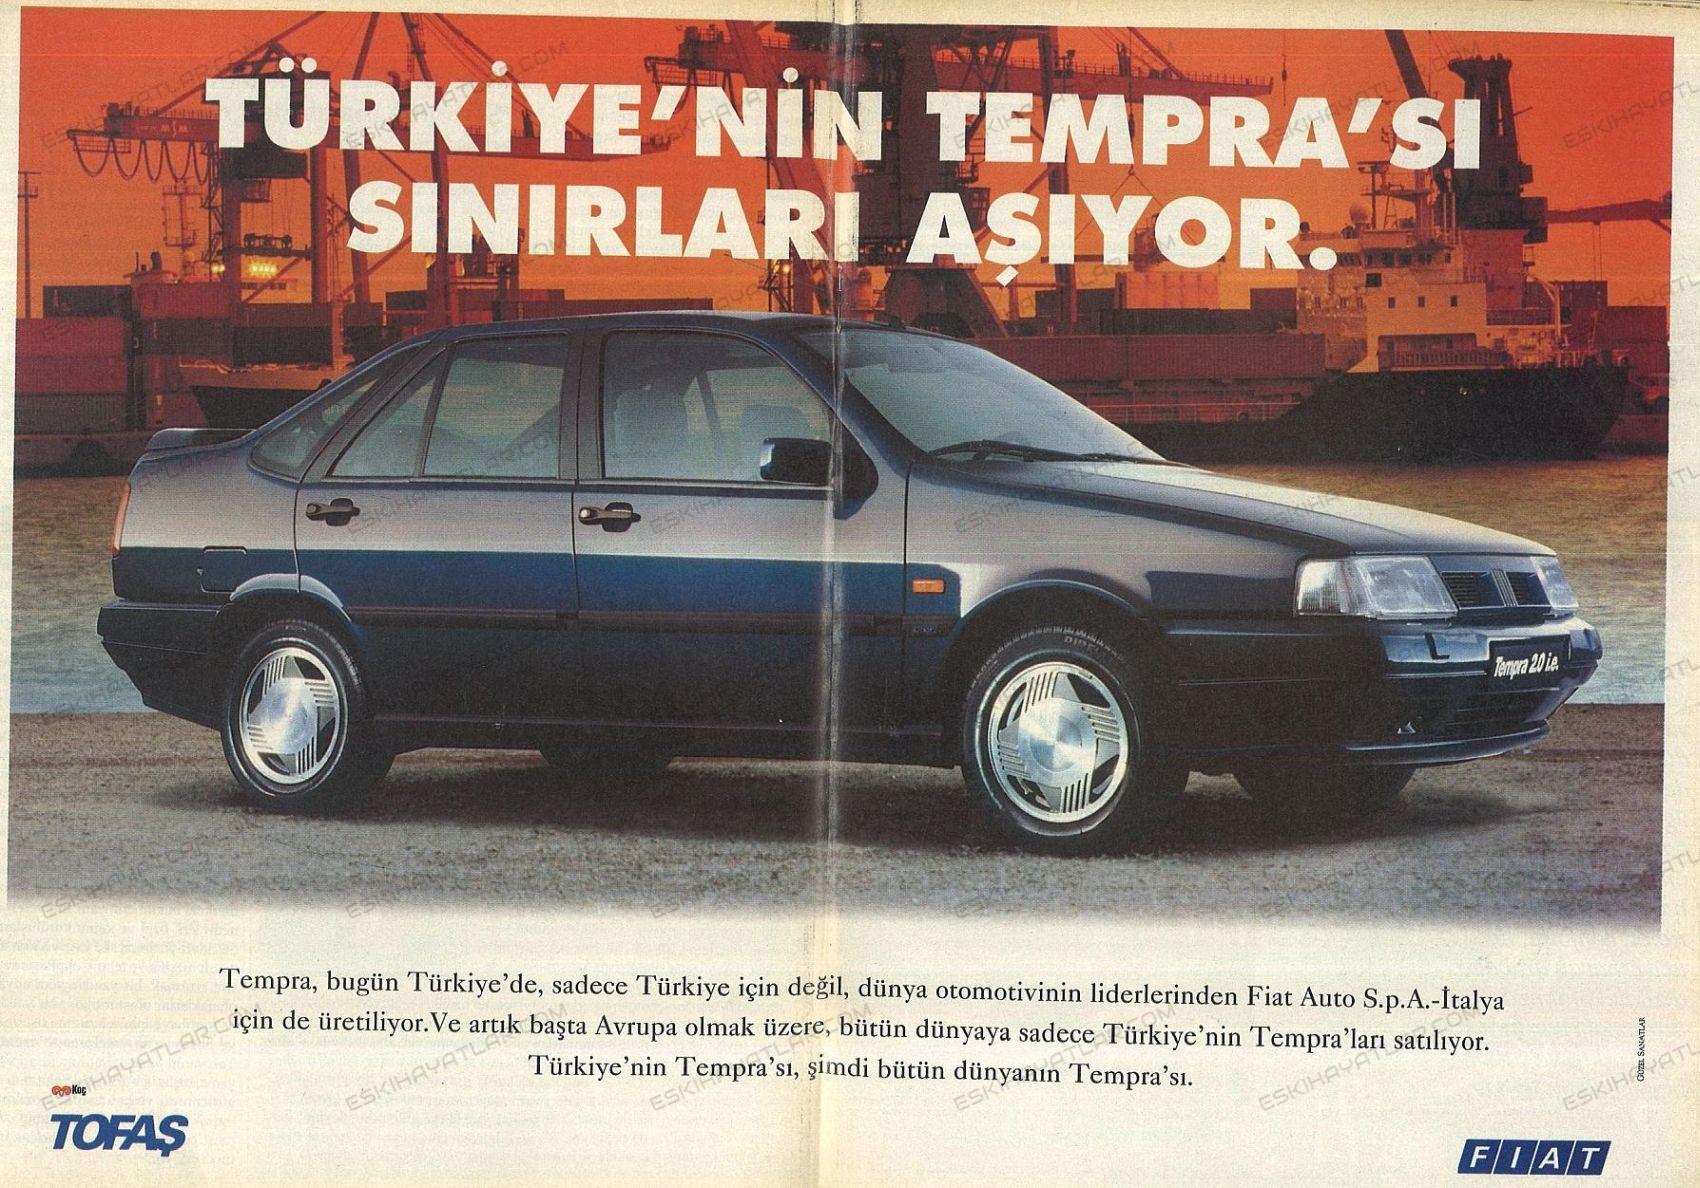 0235-tempra-reklami-1995-model-tempra-posteri-tofas-arsivi-doksanlarda-otomobil-reklamlar-fiat-turkiye-afisi